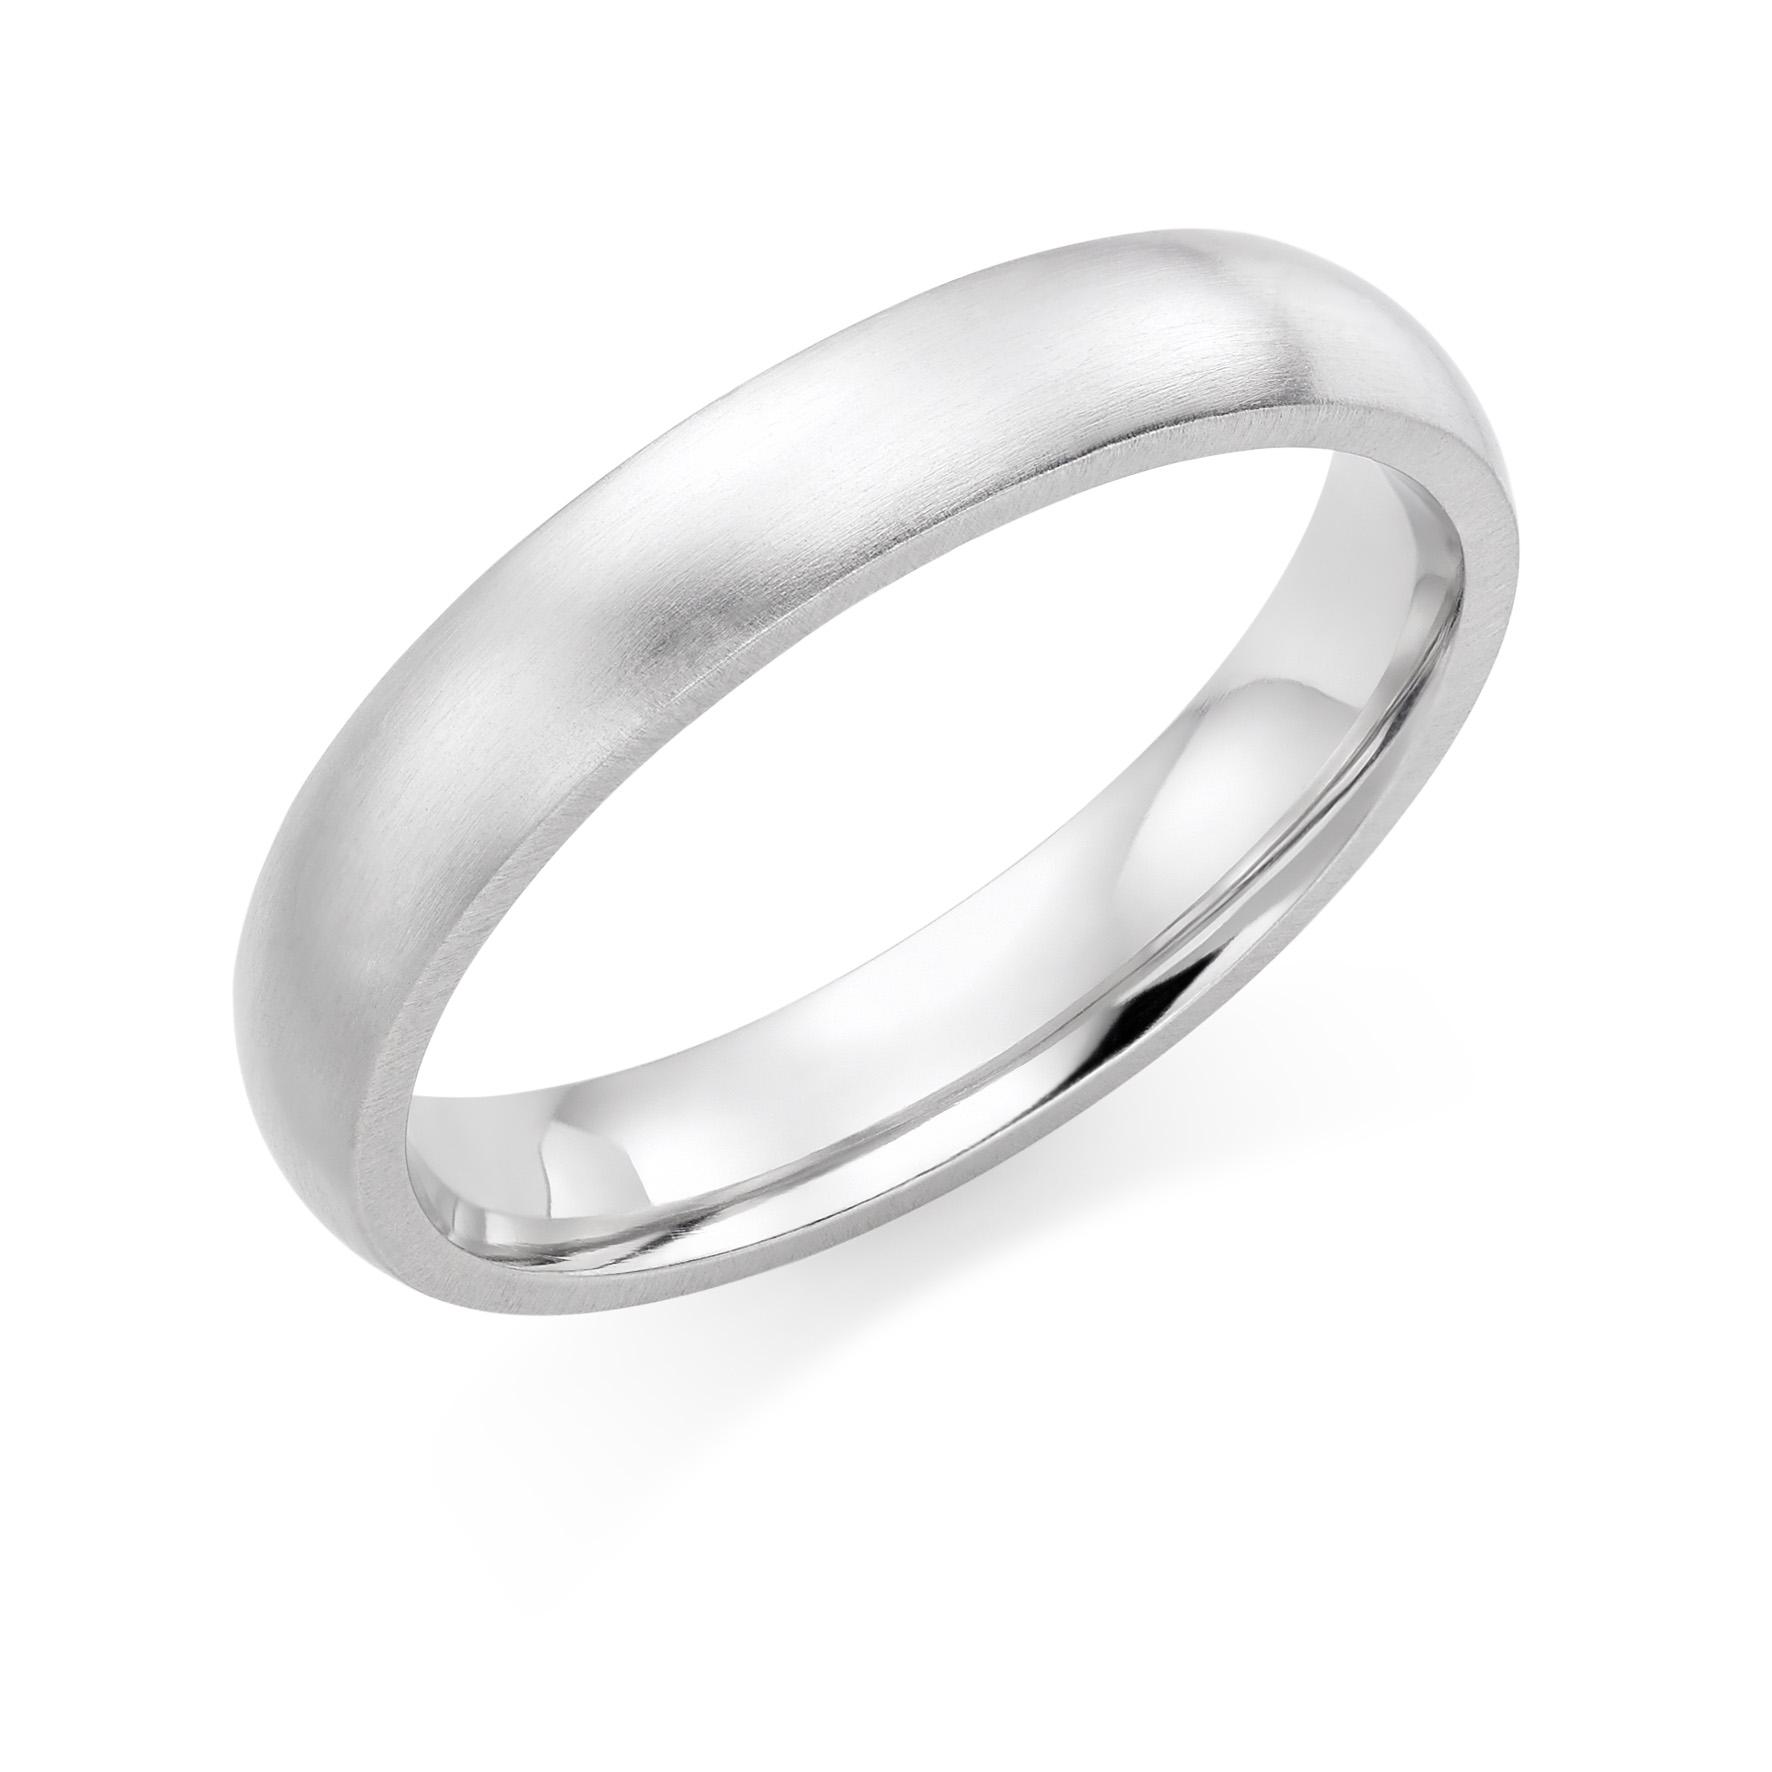 Brushed Wedding Rings in Hatton Garden